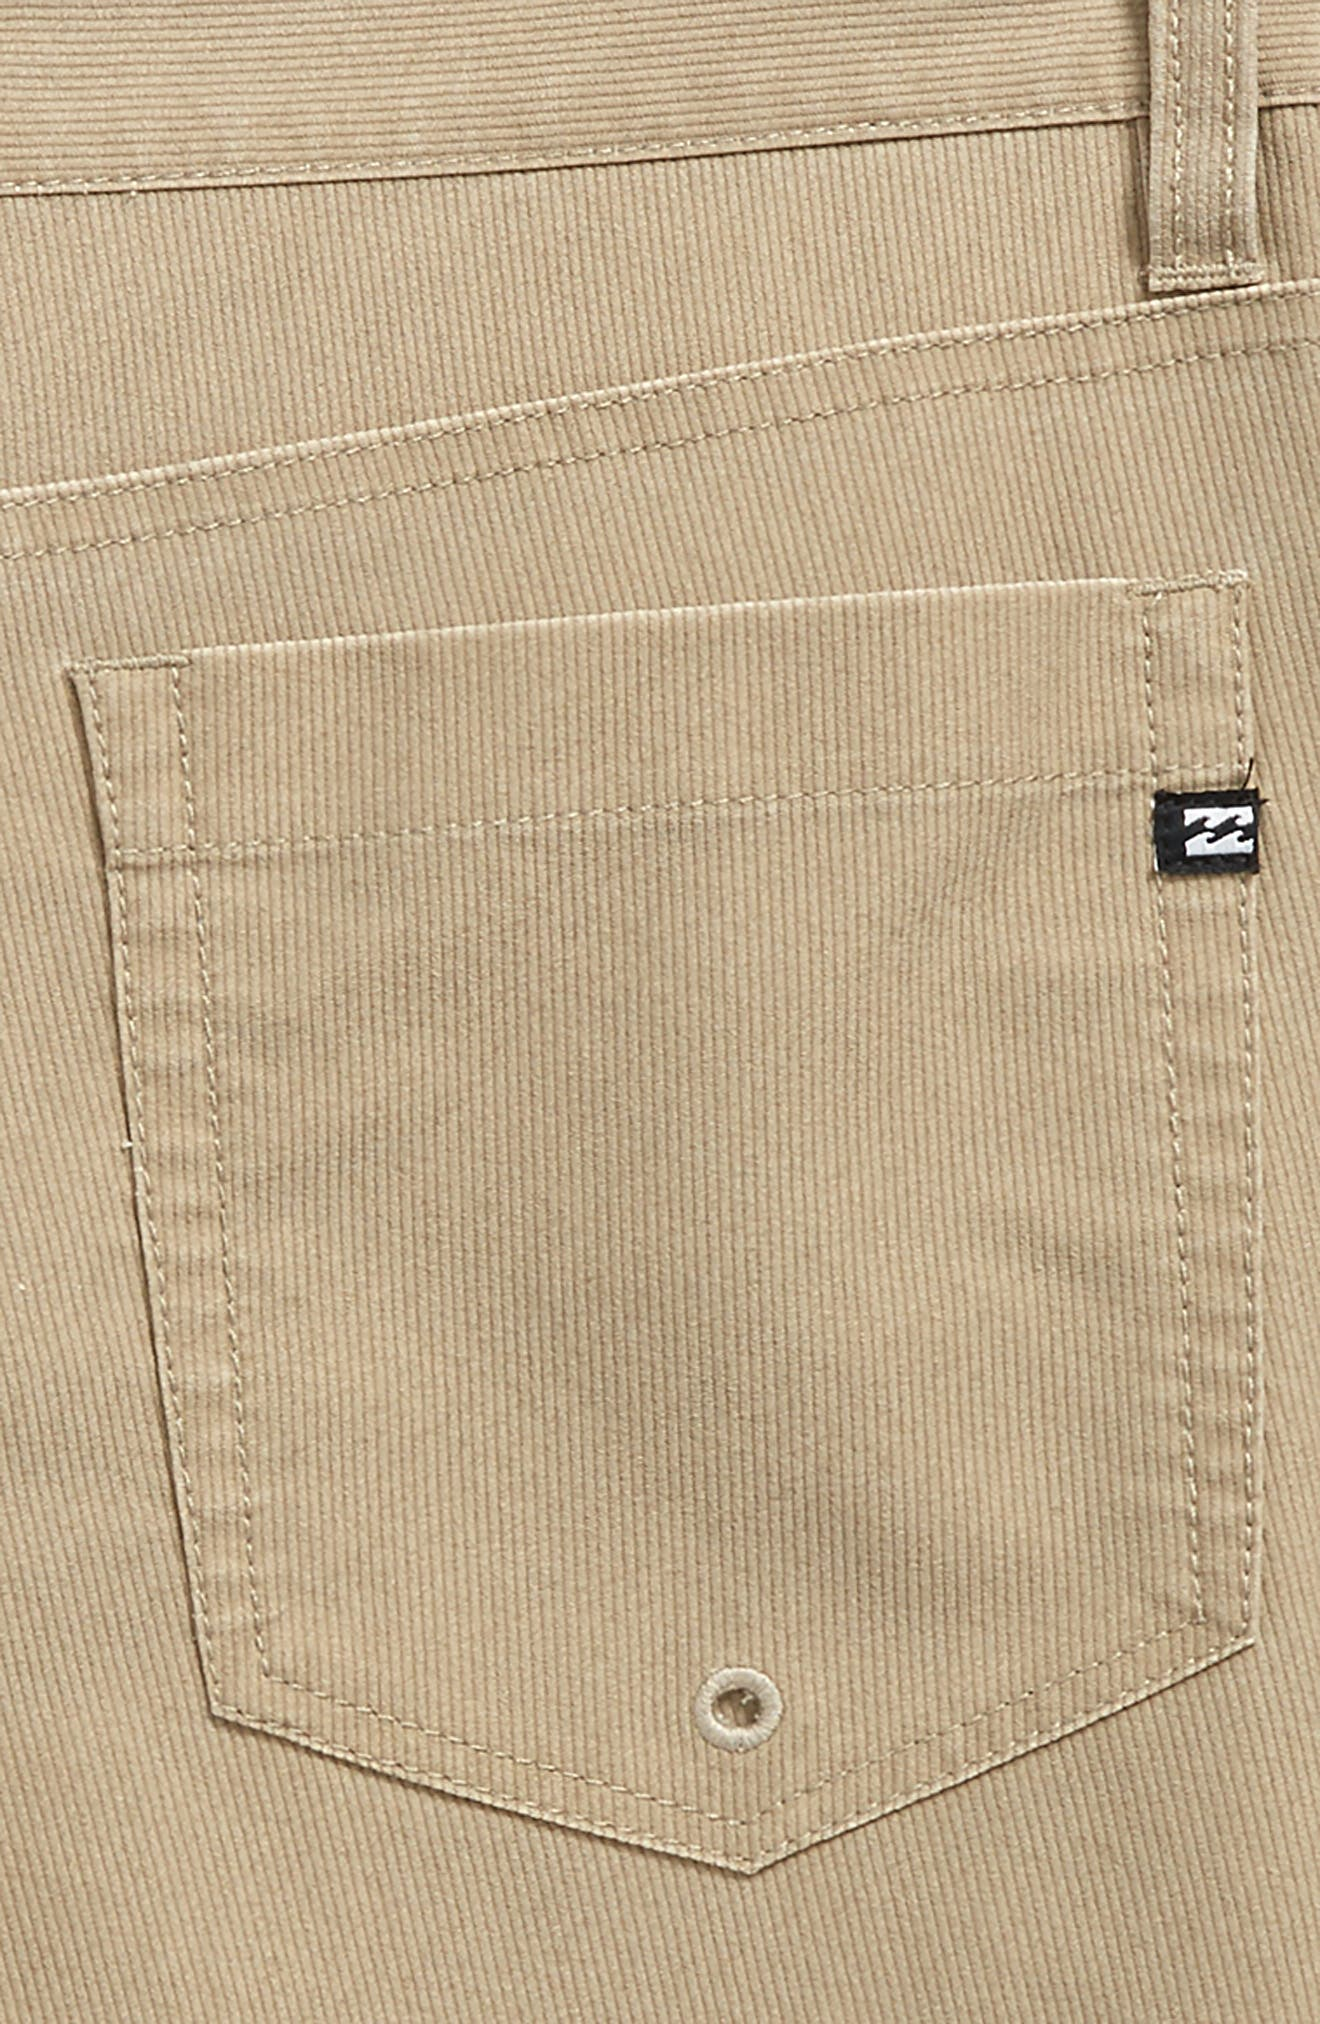 Outsider X Surf Corduroy Hybrid Shorts,                             Alternate thumbnail 3, color,                             259